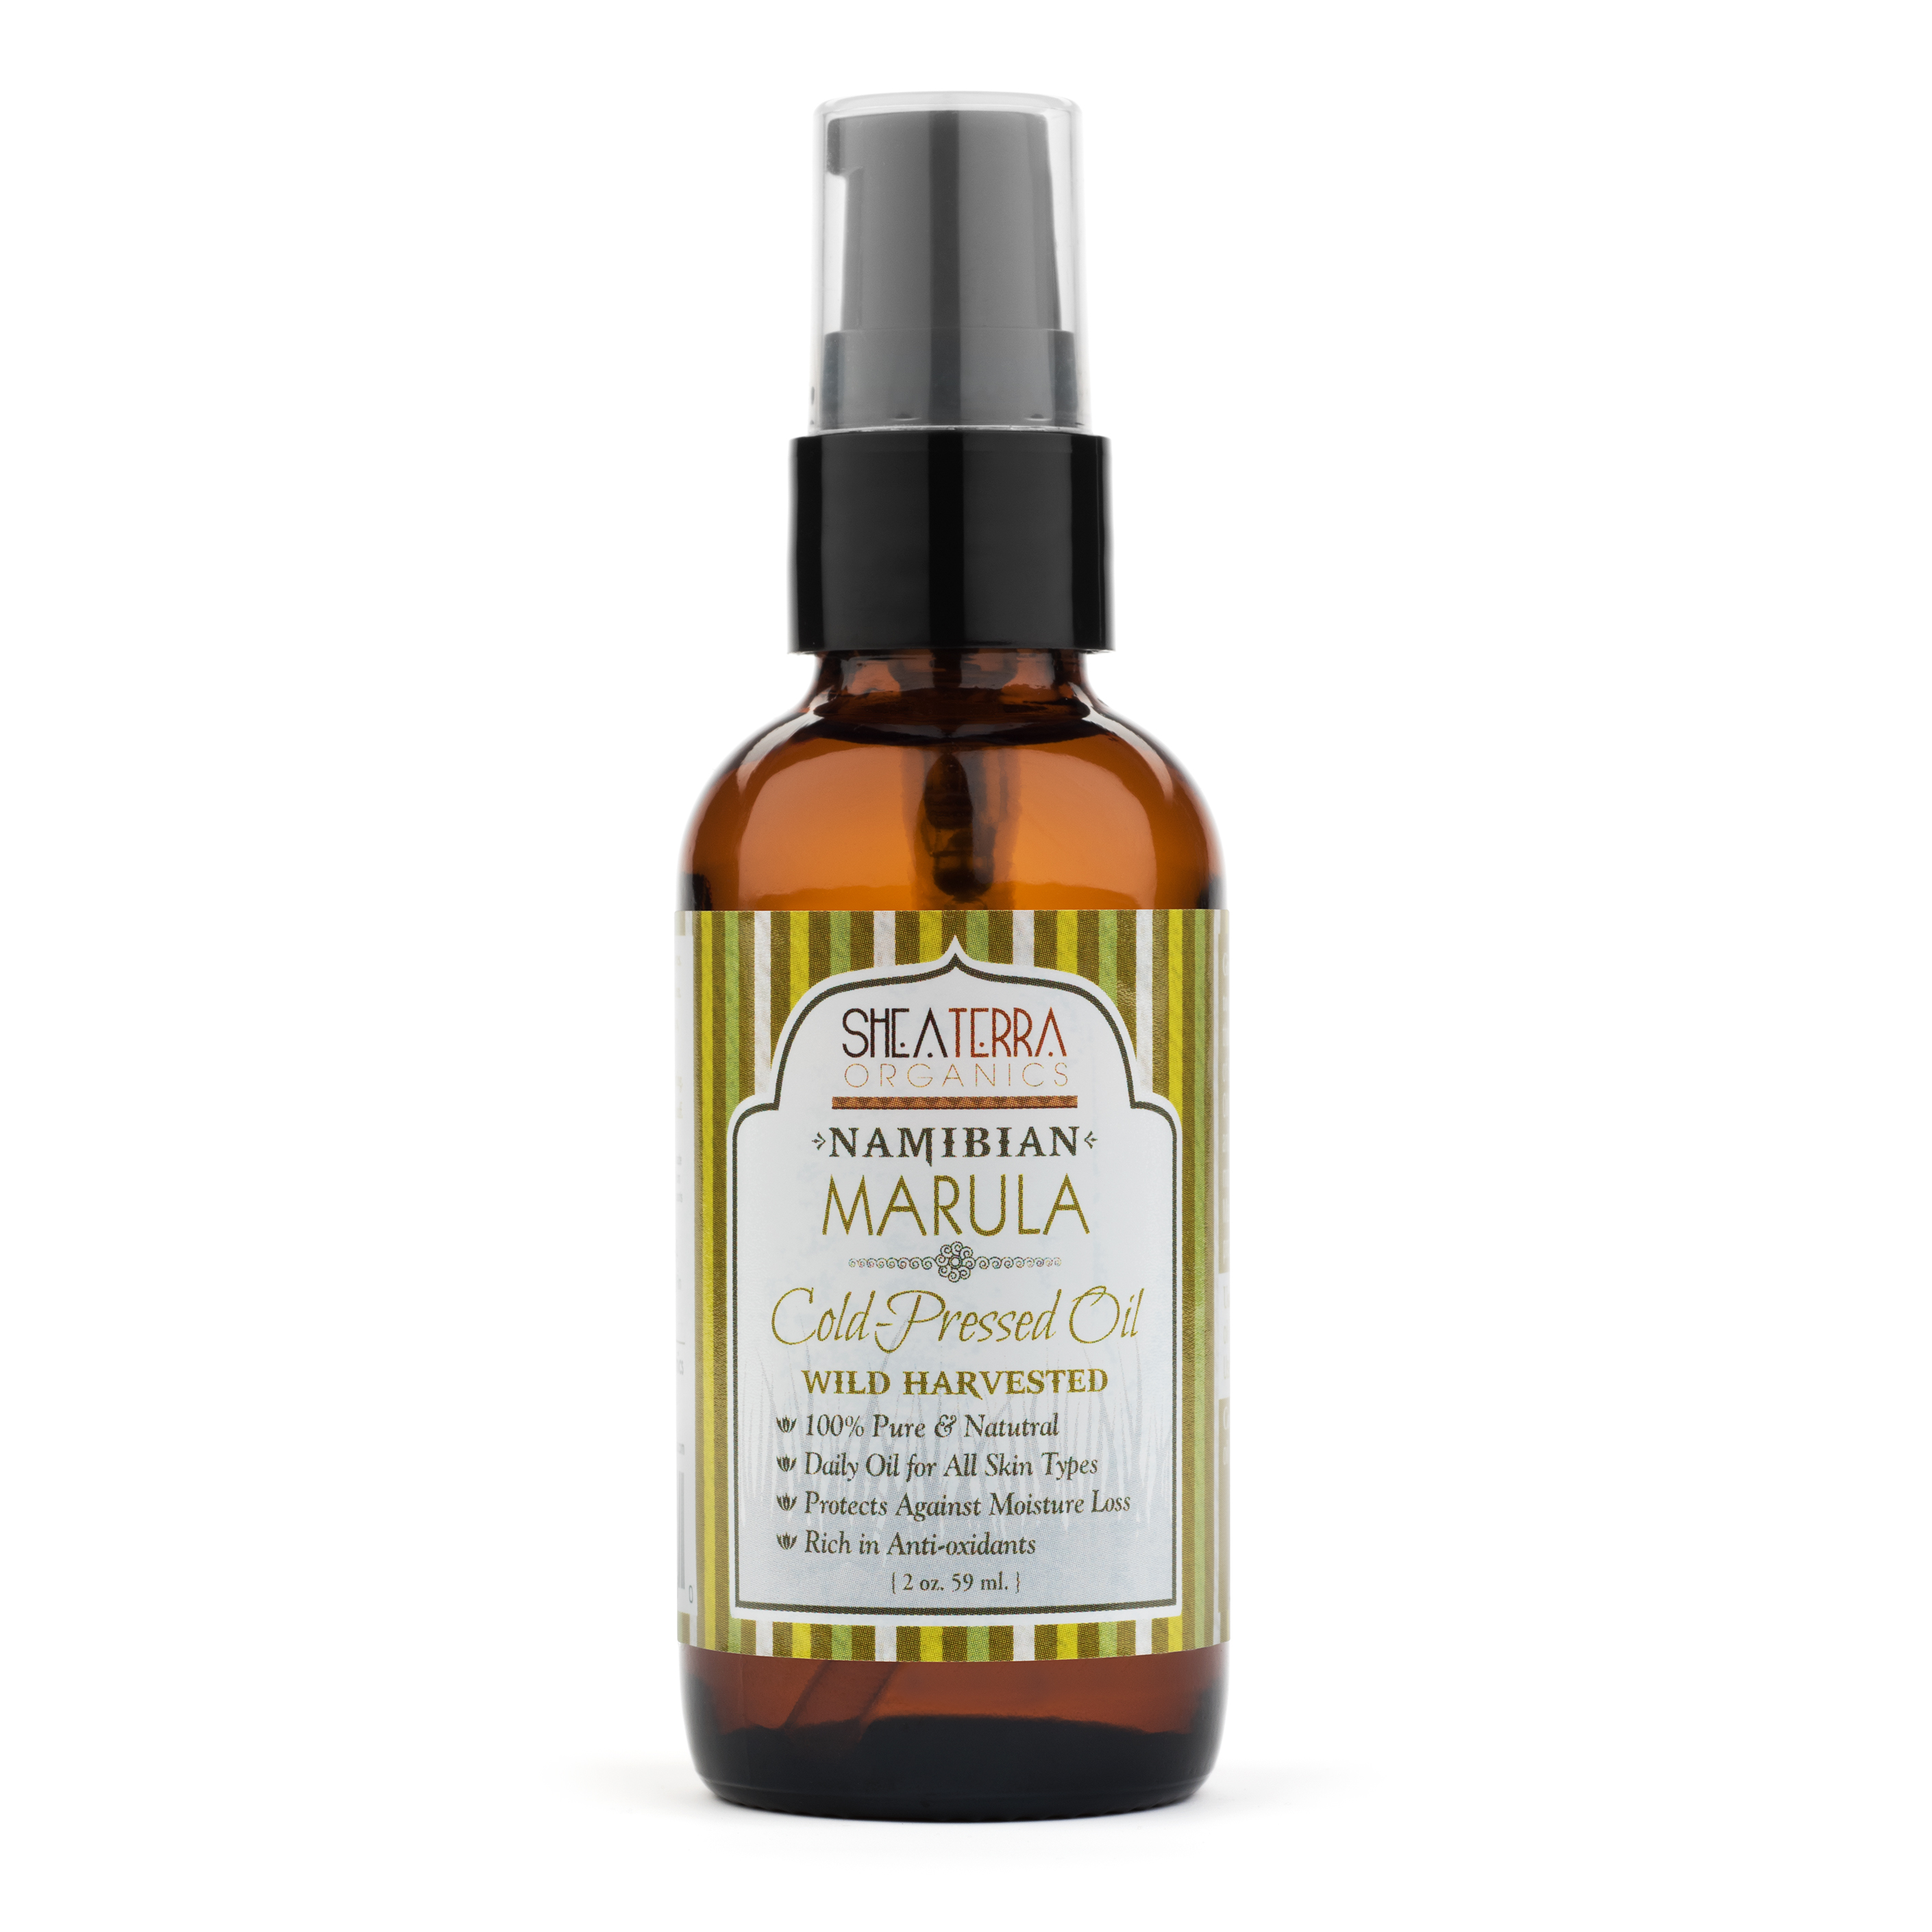 Shea Terra's Namibian marula oil